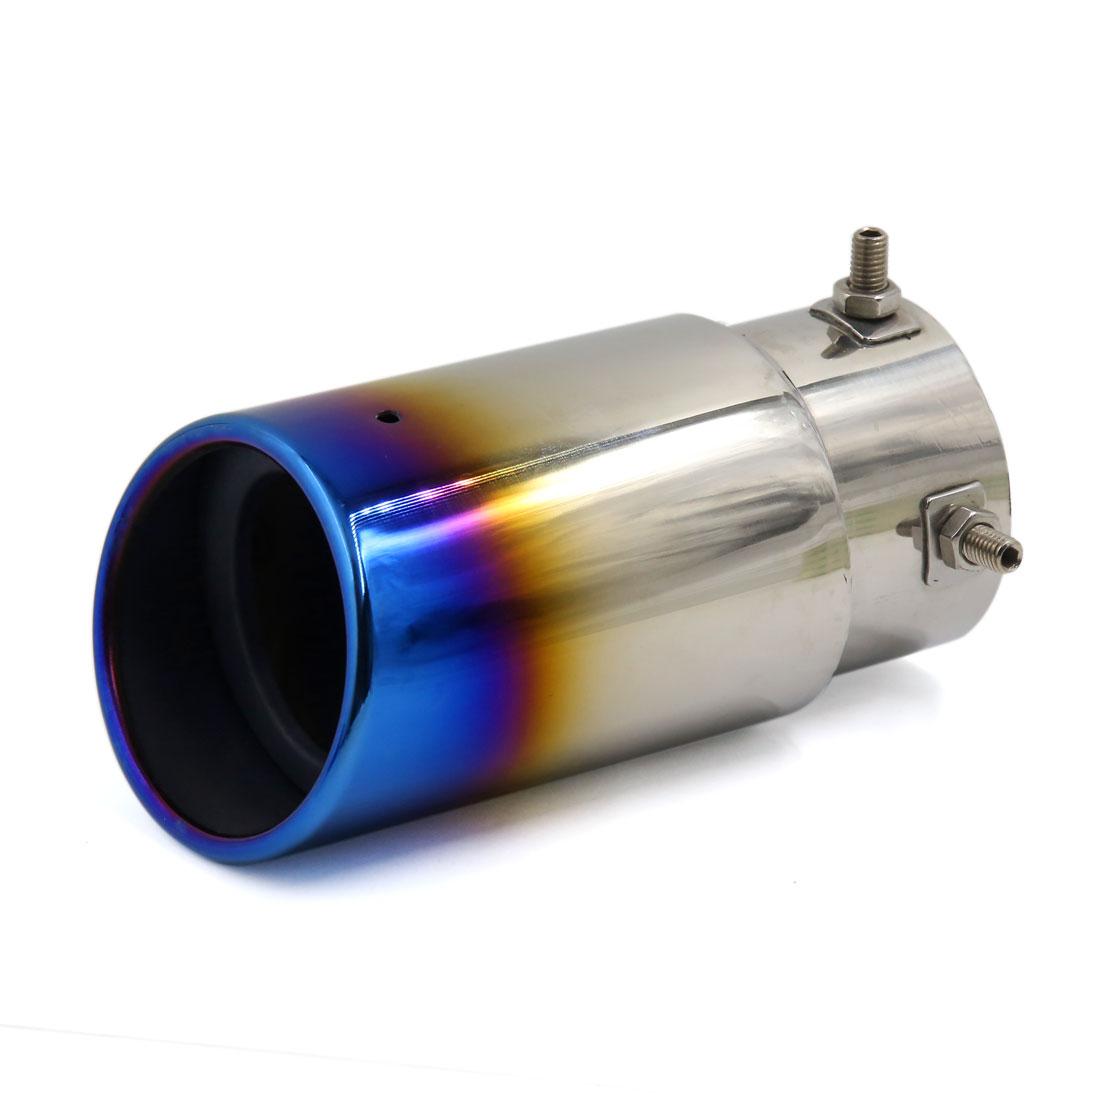 Vehicle Car Titanium Blue Exhaust Muffler Tip Pipe Silencer for Honda